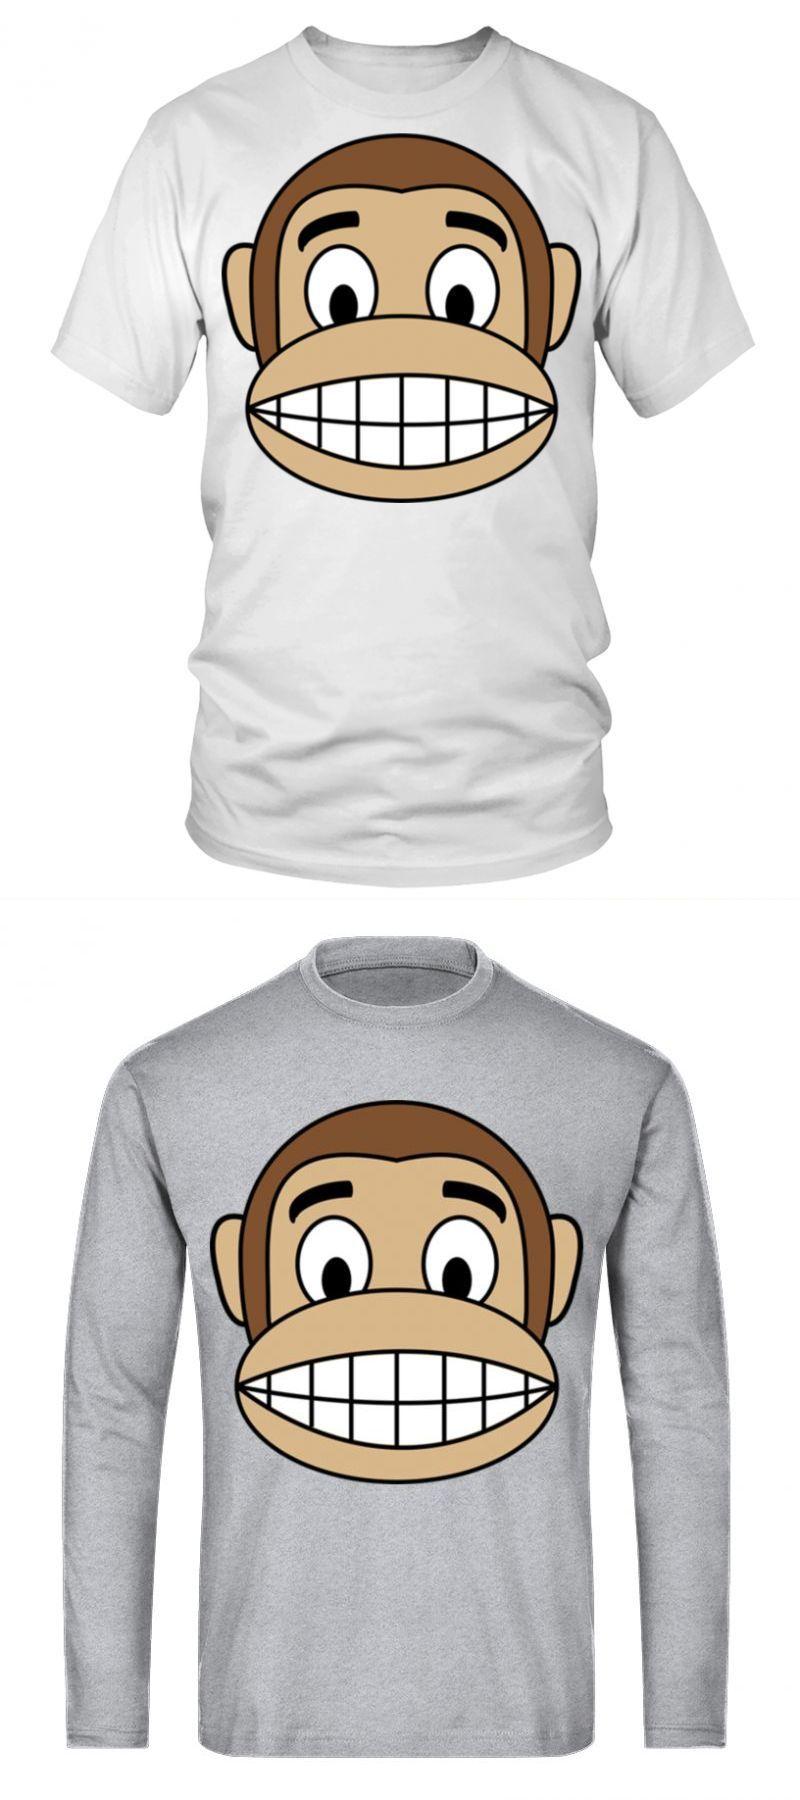 ec3edaa70 Monkey t-shirt for men happy monkey emoji light - tshirt arctic monkeys  womens t shirt #monkey #t-shirt #for #men #happy #emoji #light #tshirt # arctic ...